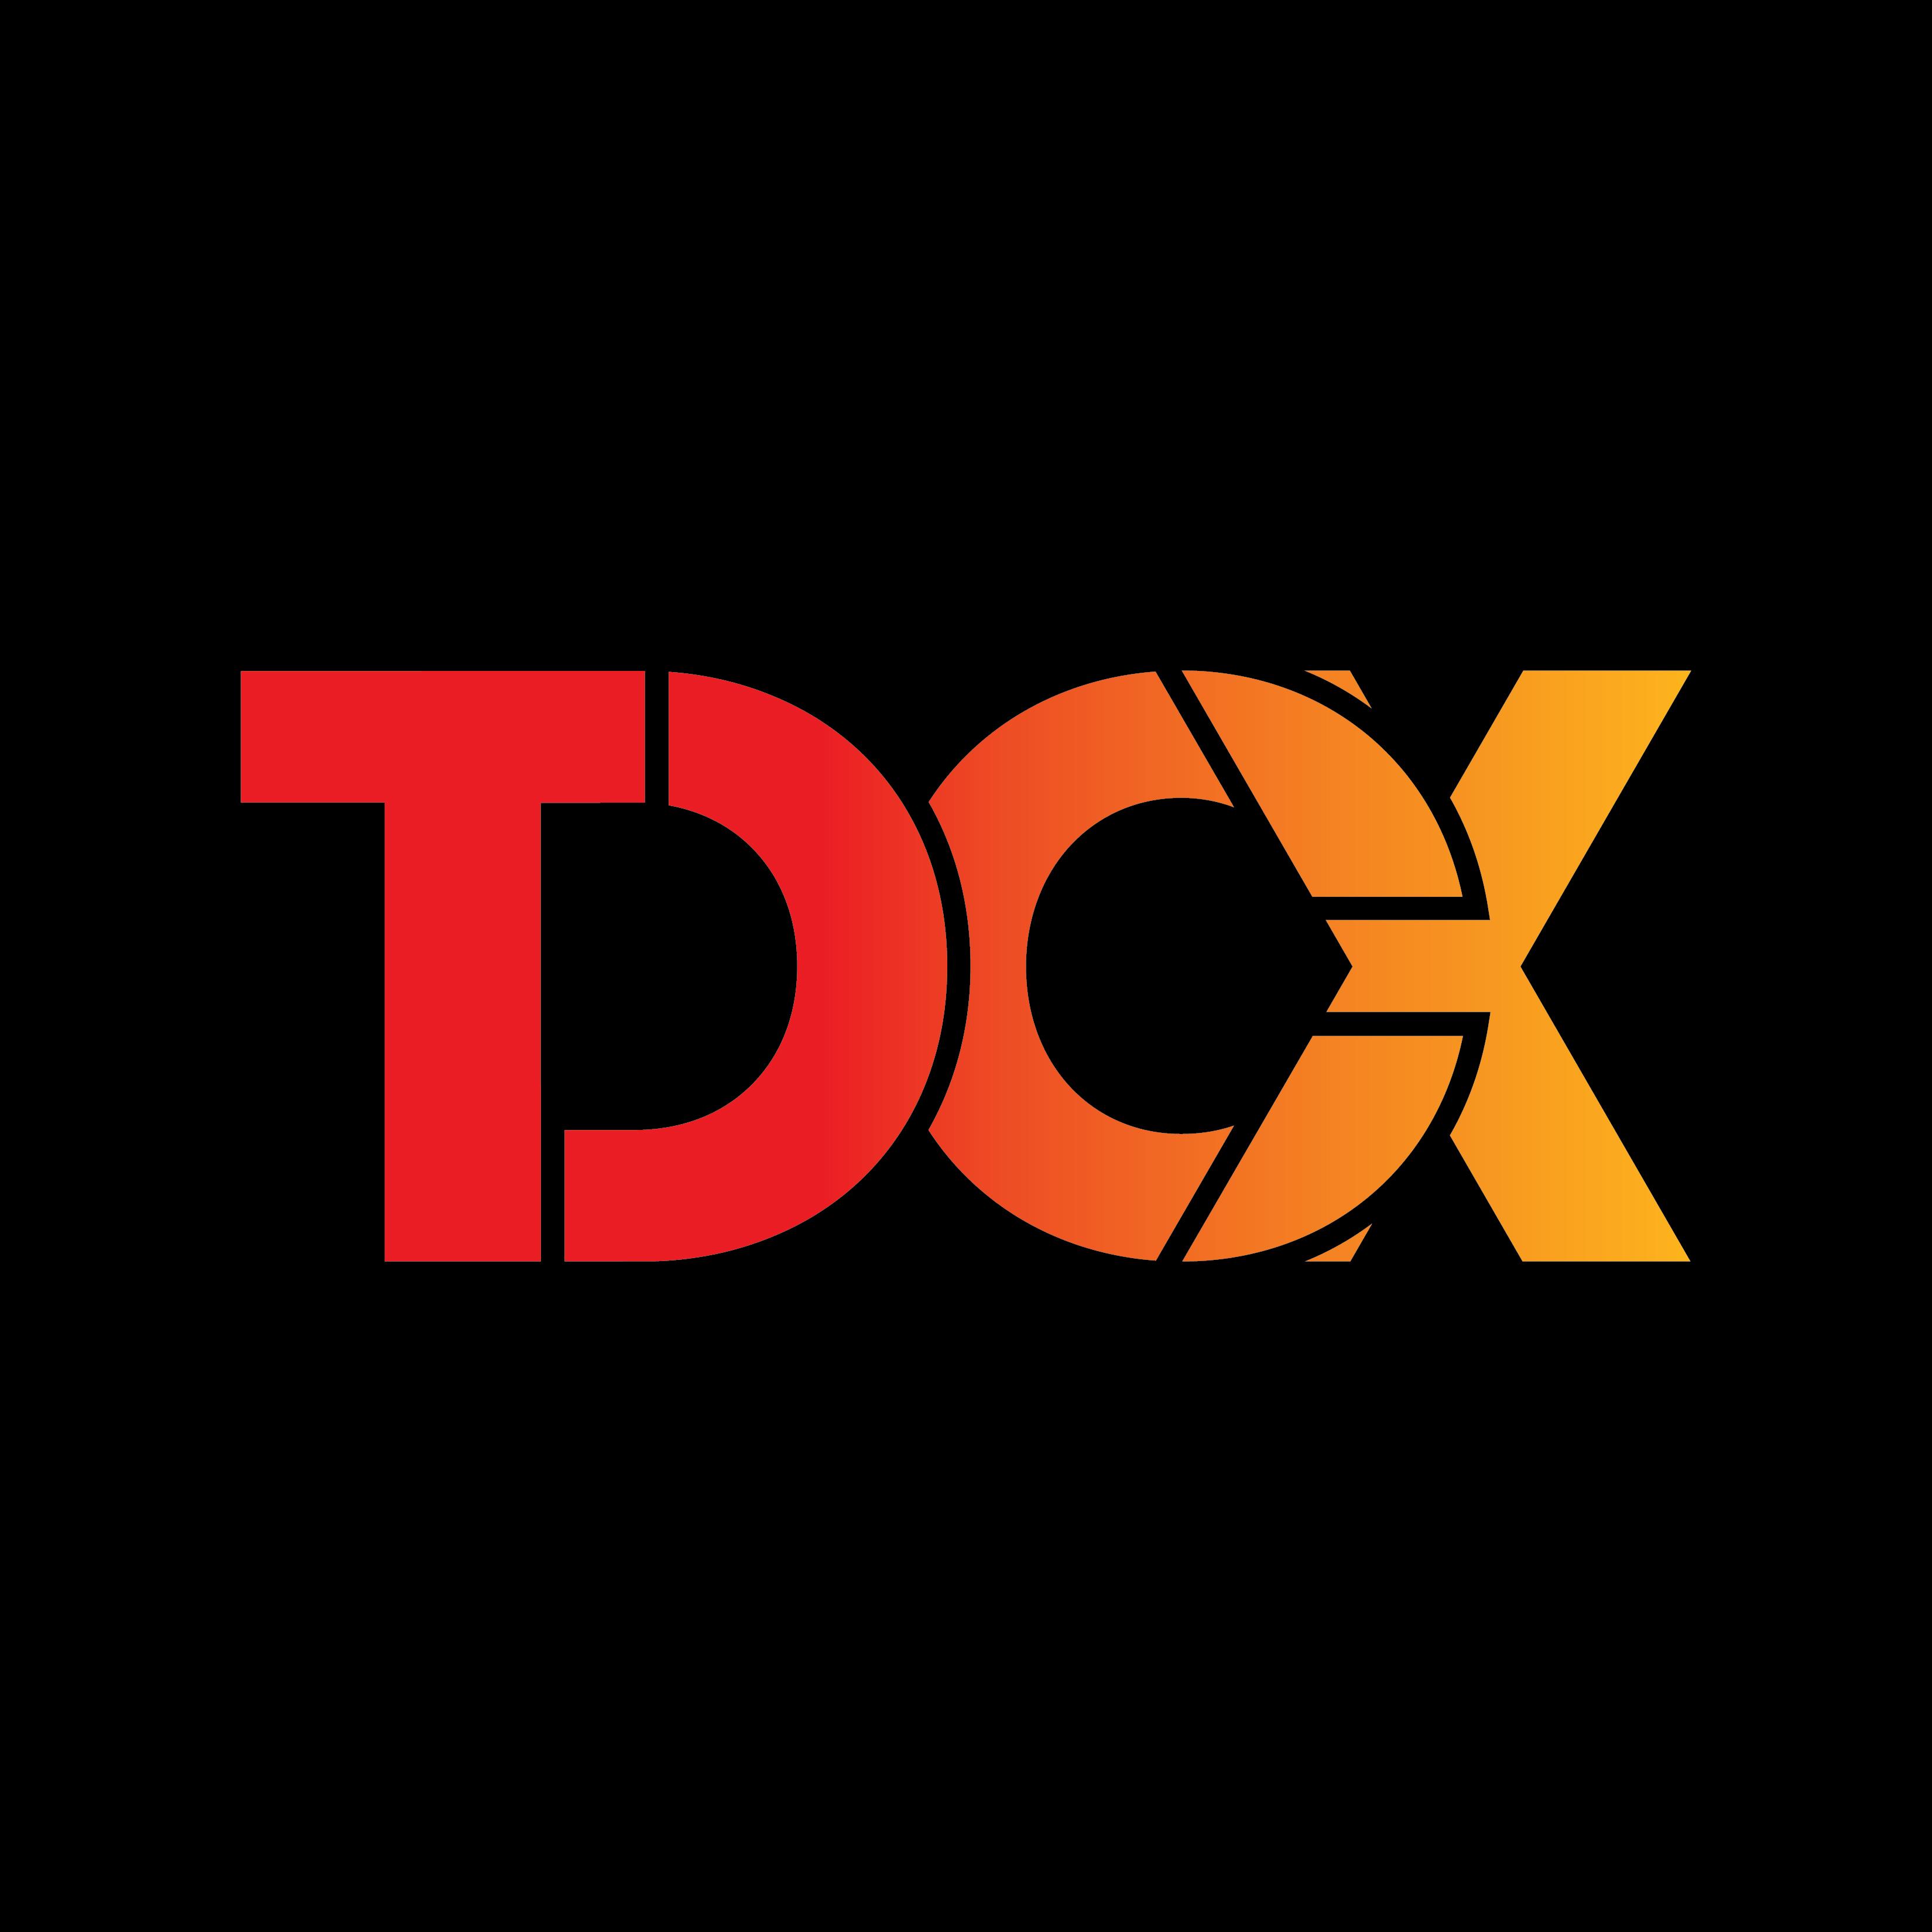 jobs in TDCX (MY) Sdn. Bhd.